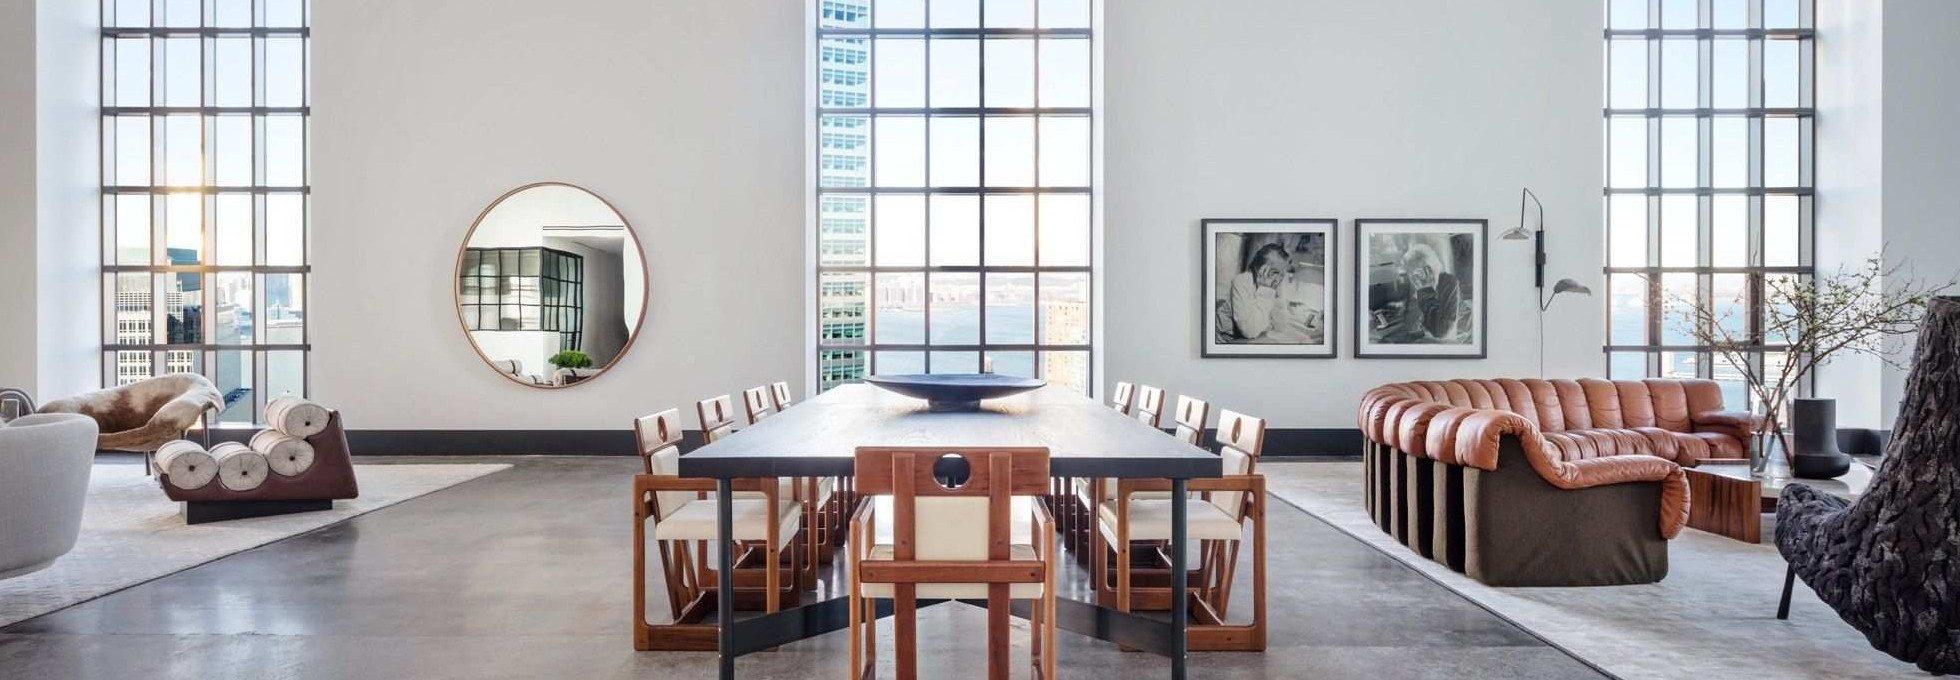 Kelly Behun Studio – Best Design Firms in New York City (9)